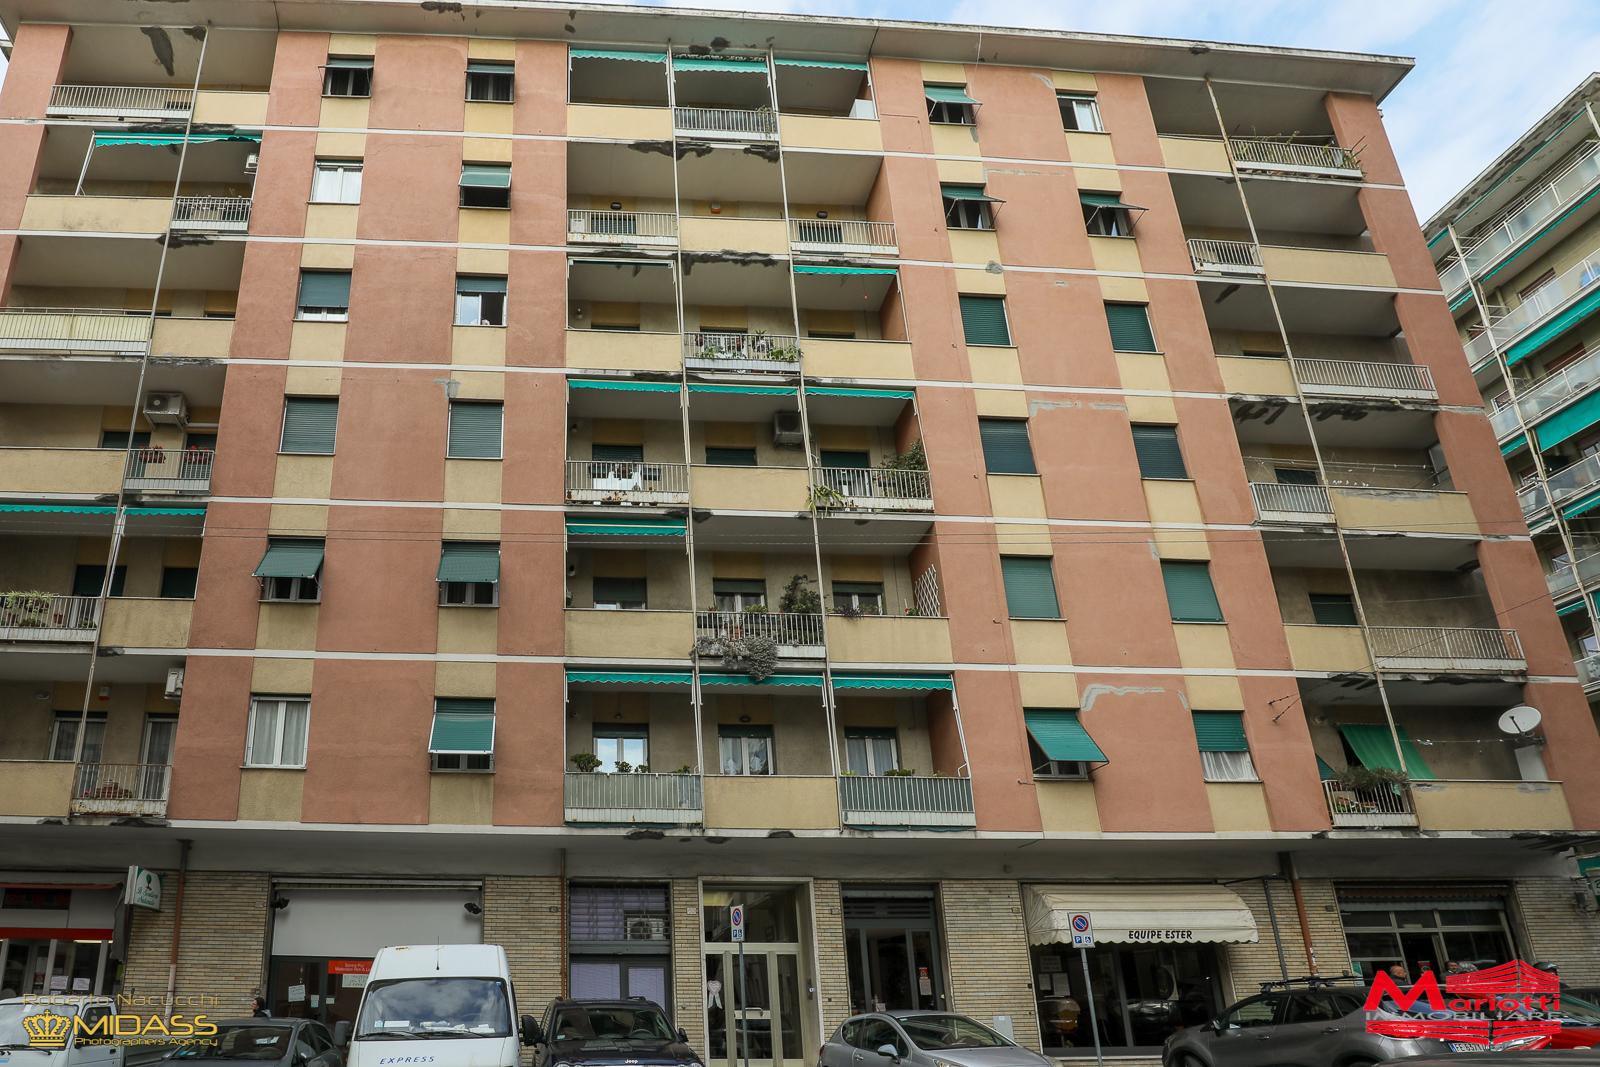 San Fruttuoso – Via Cellini/P.za Solari vani 6 mq. 95